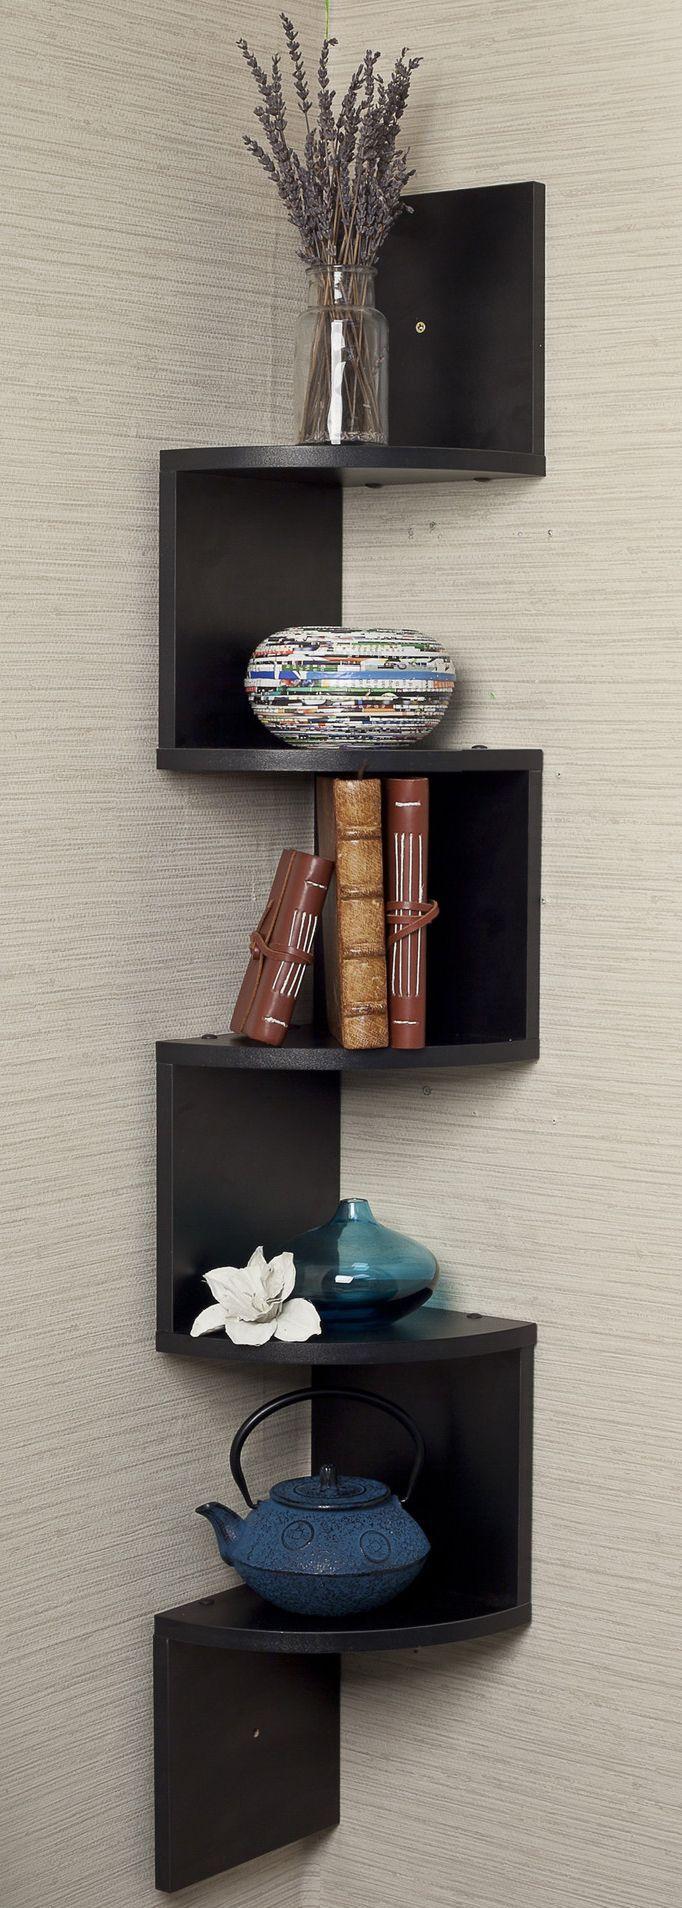 Black Corner Zig Zag Wall Shelf Diy Make Do